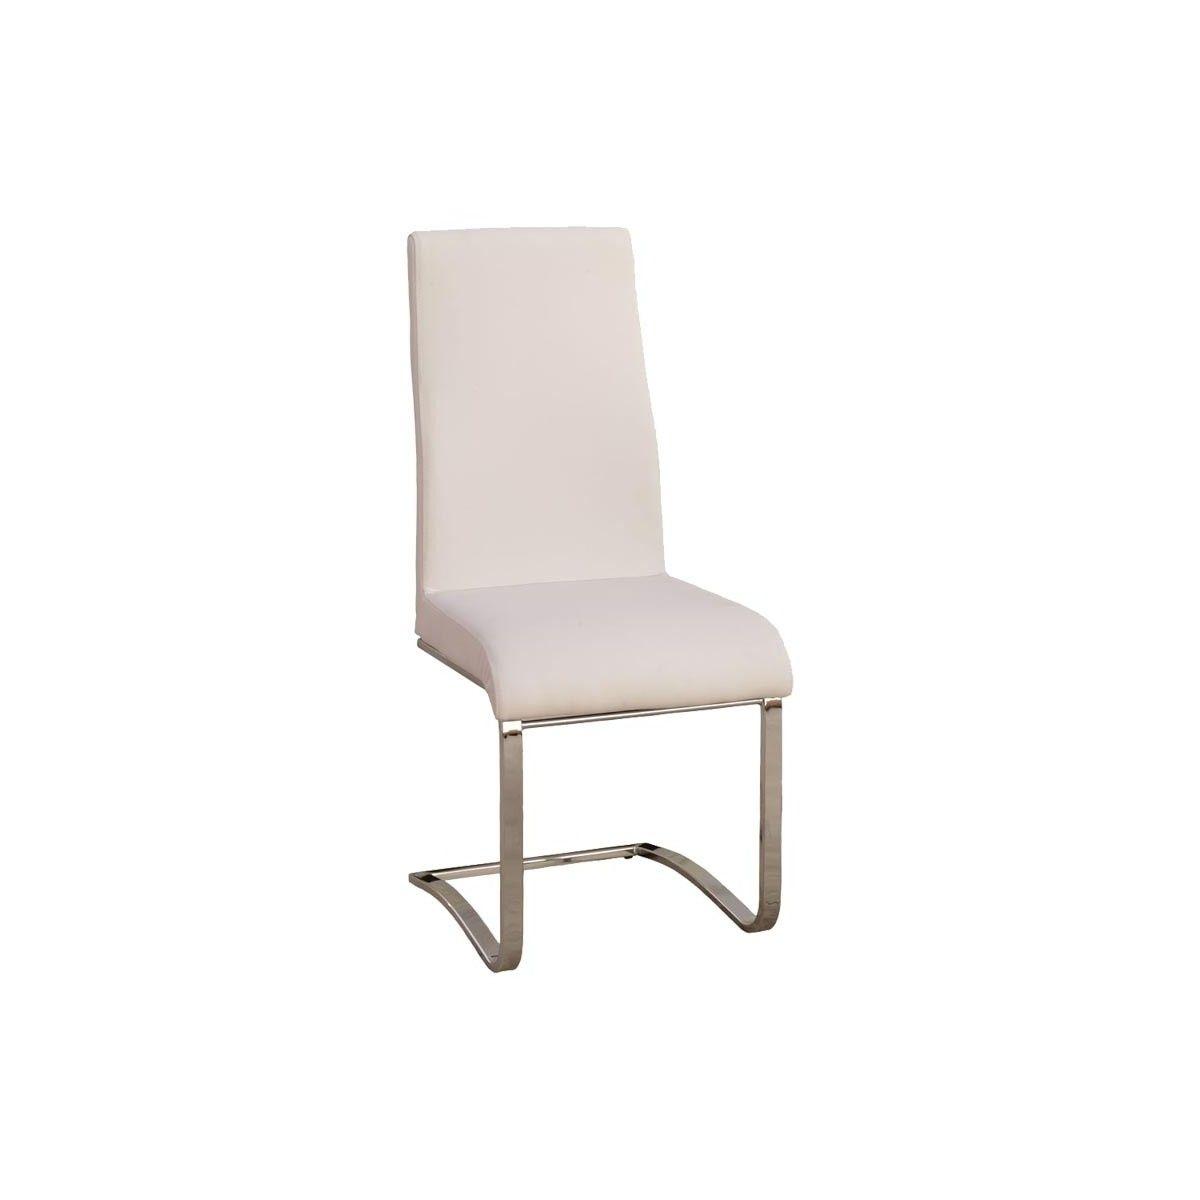 sillas cromadas baratas comedor